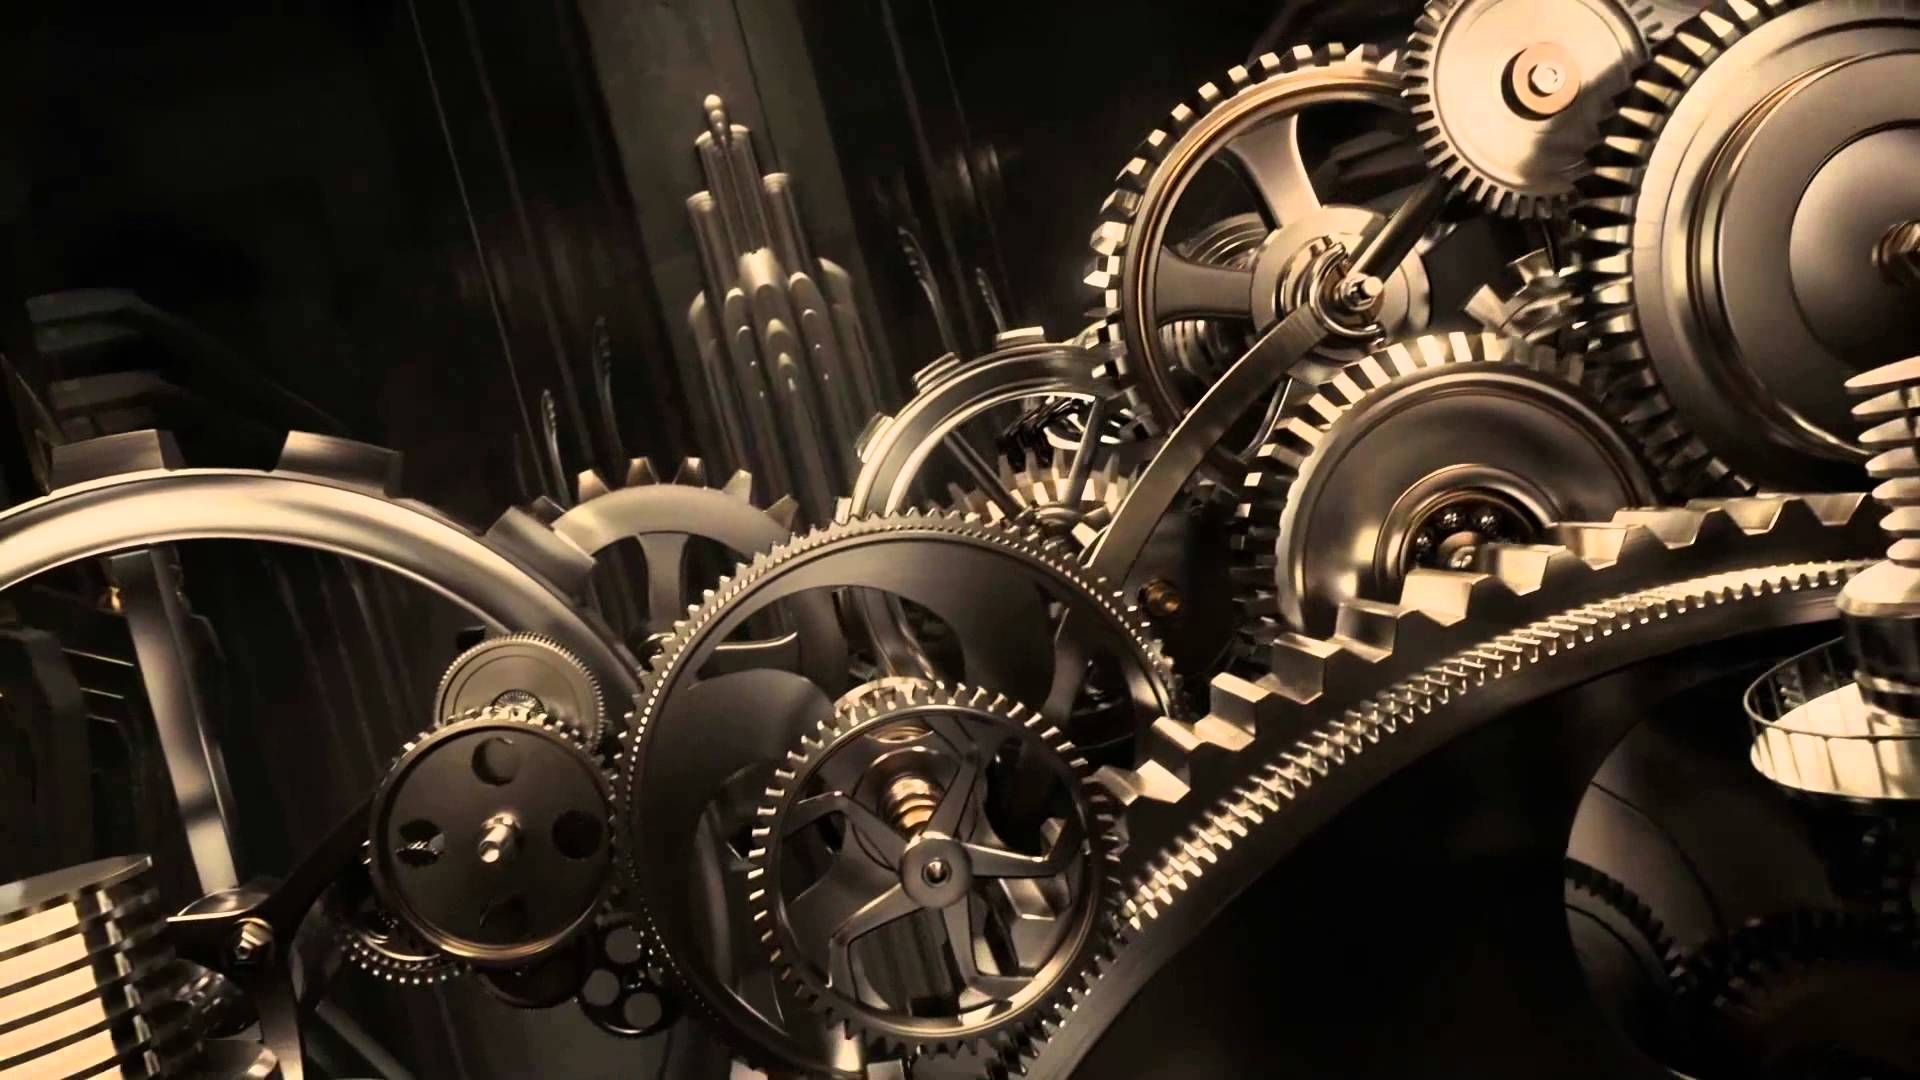 Mechanical Engineering Wallpapers For PC  WallpaperSafari